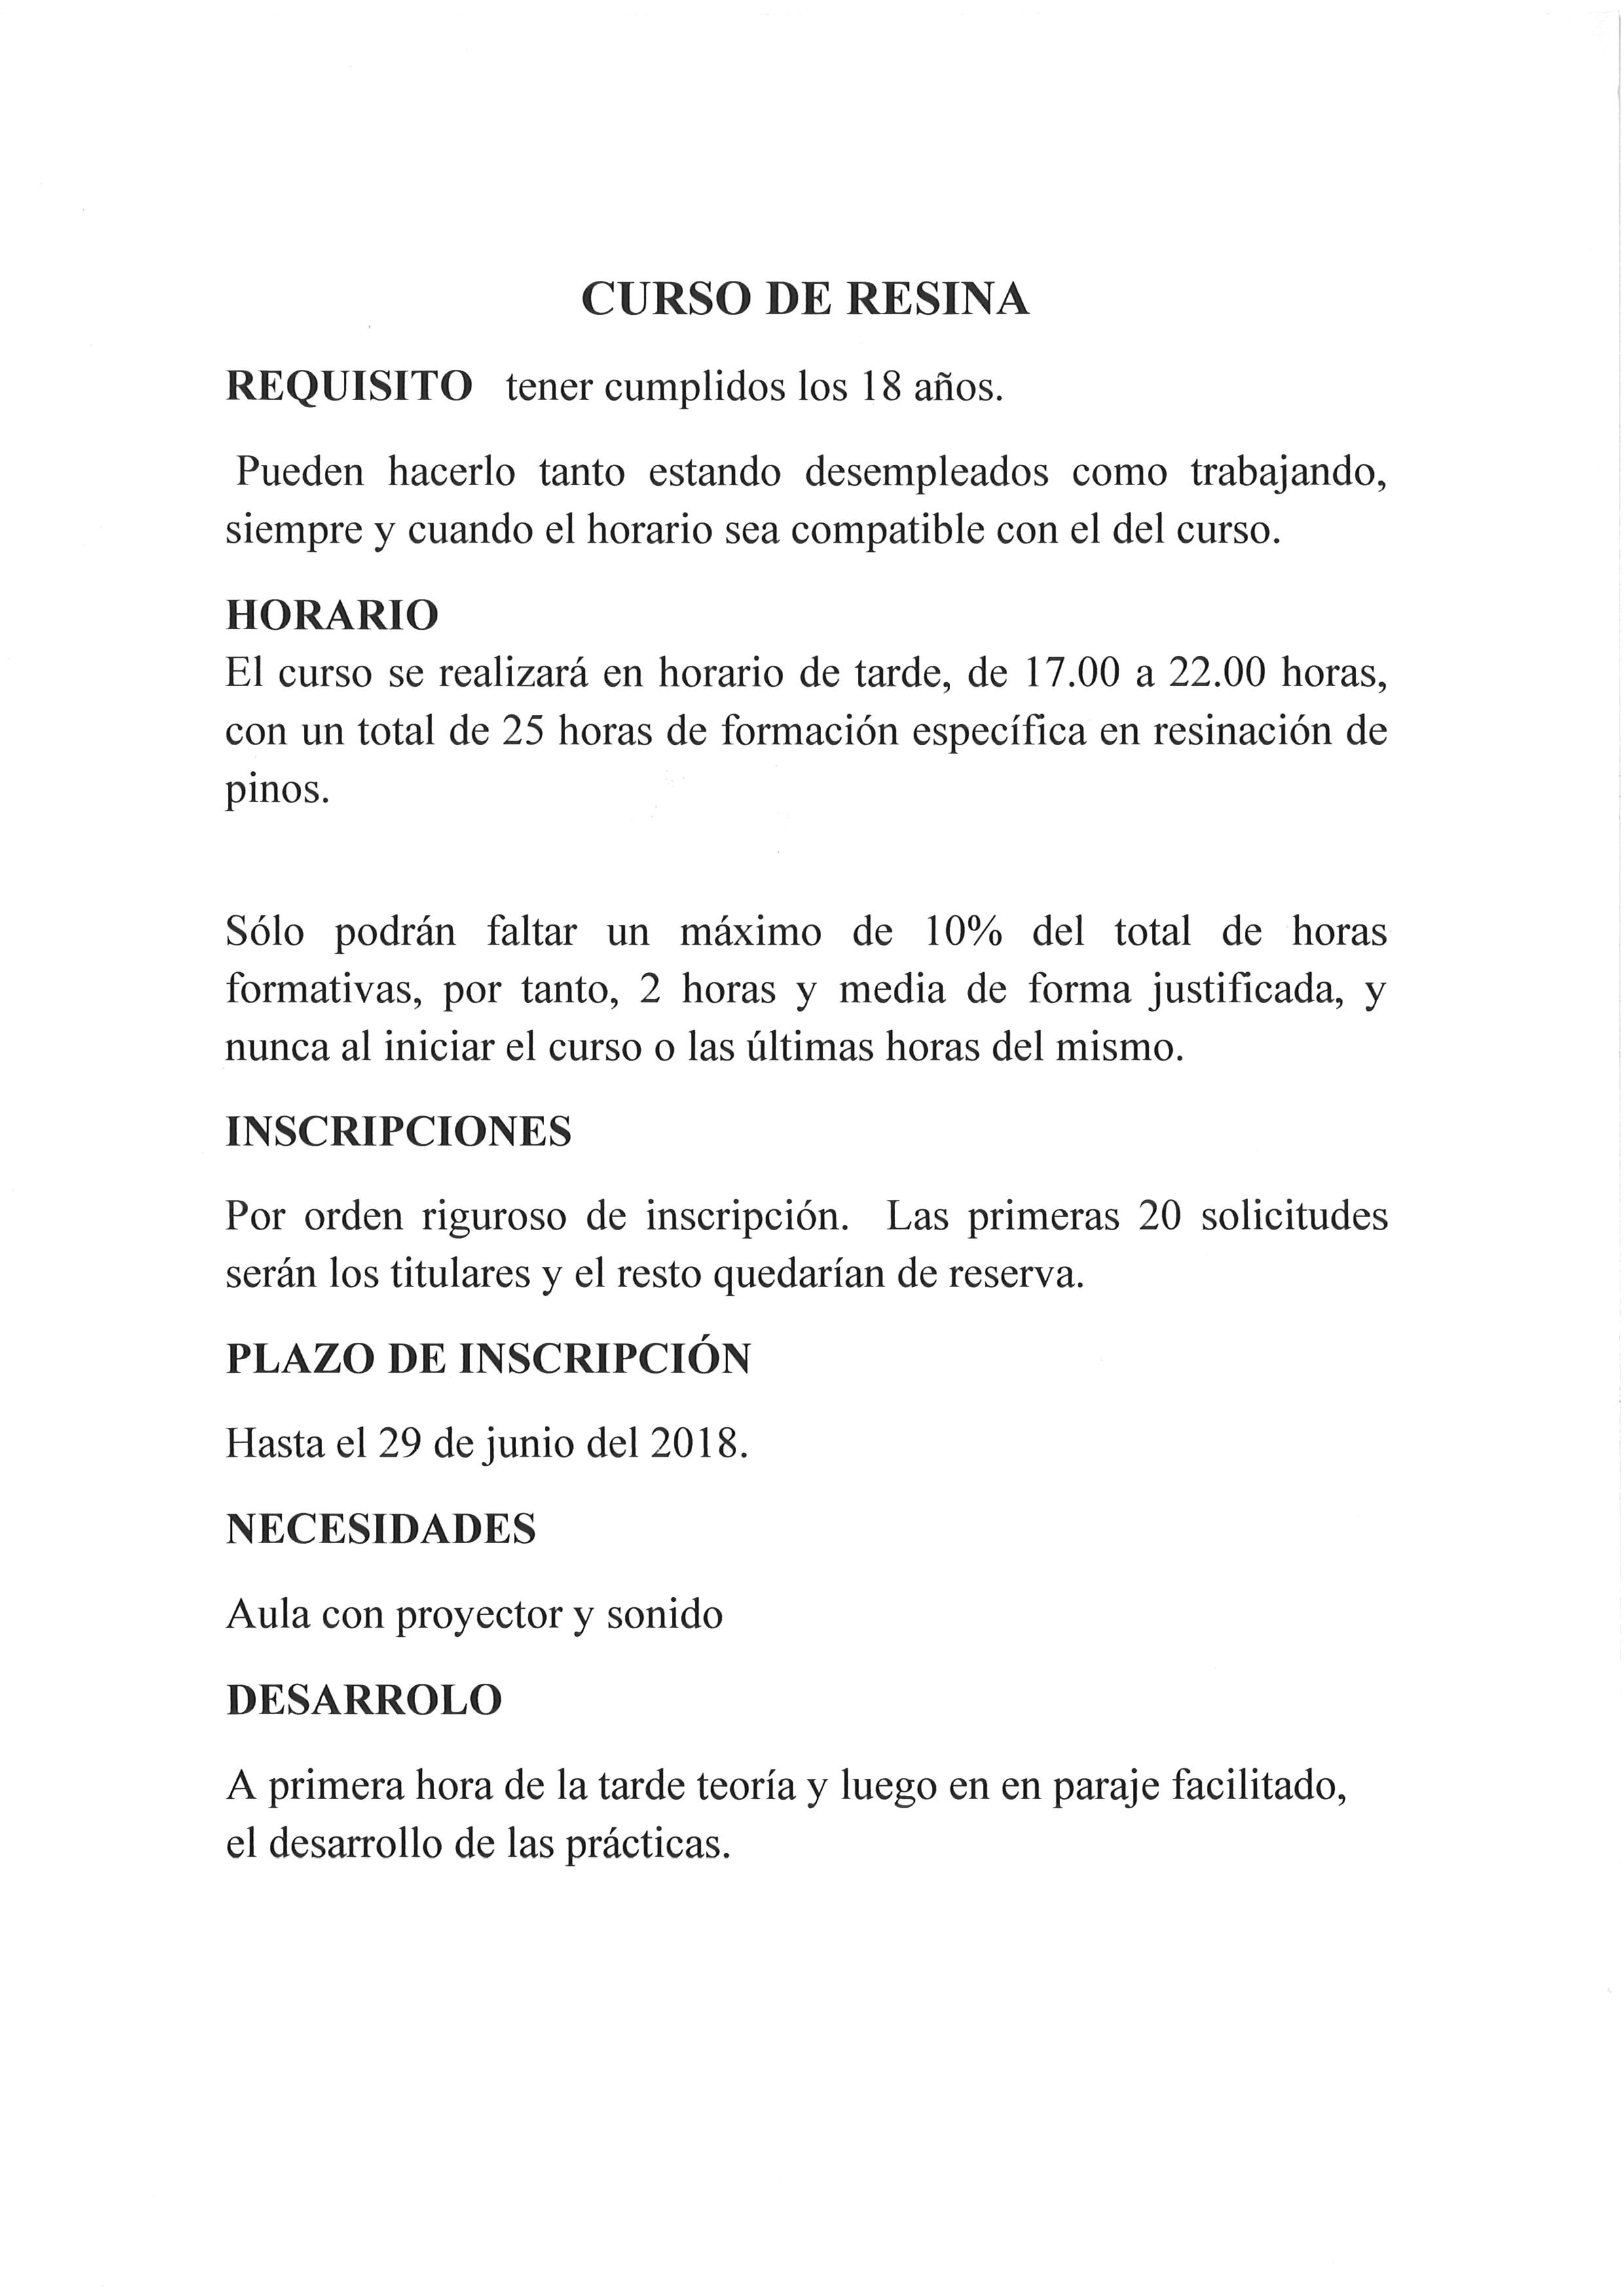 Calendario Escolar 2019 Badajoz Más Recientemente Liberado Pinofranqueado Informa Servicio De Unicaci³n Va Web Of Calendario Escolar 2019 Badajoz Recientes Calaméo Gara